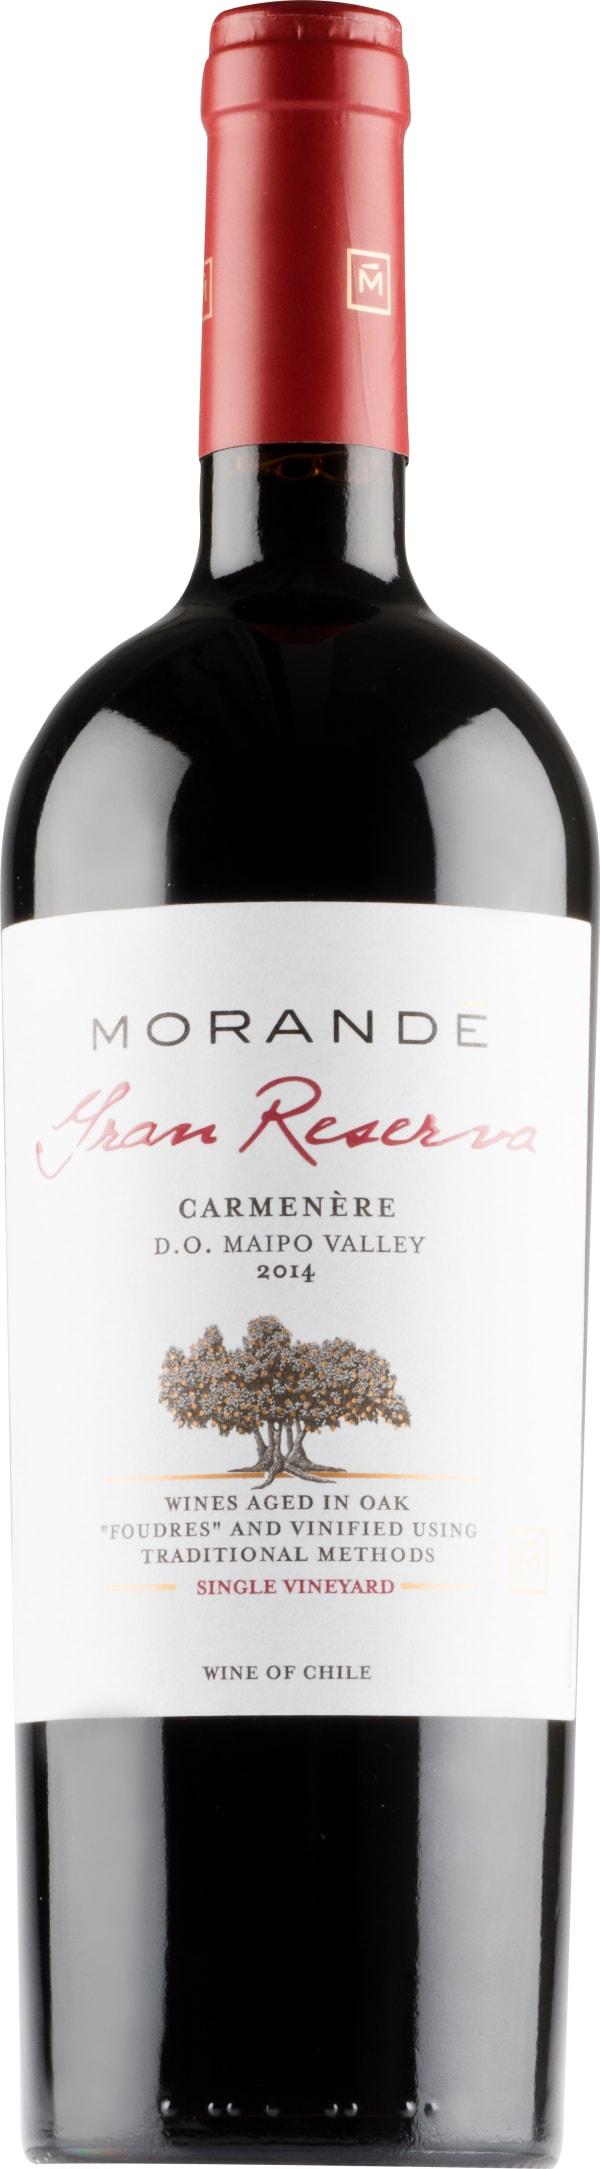 Morande Gran Reserva Carmenère 2014